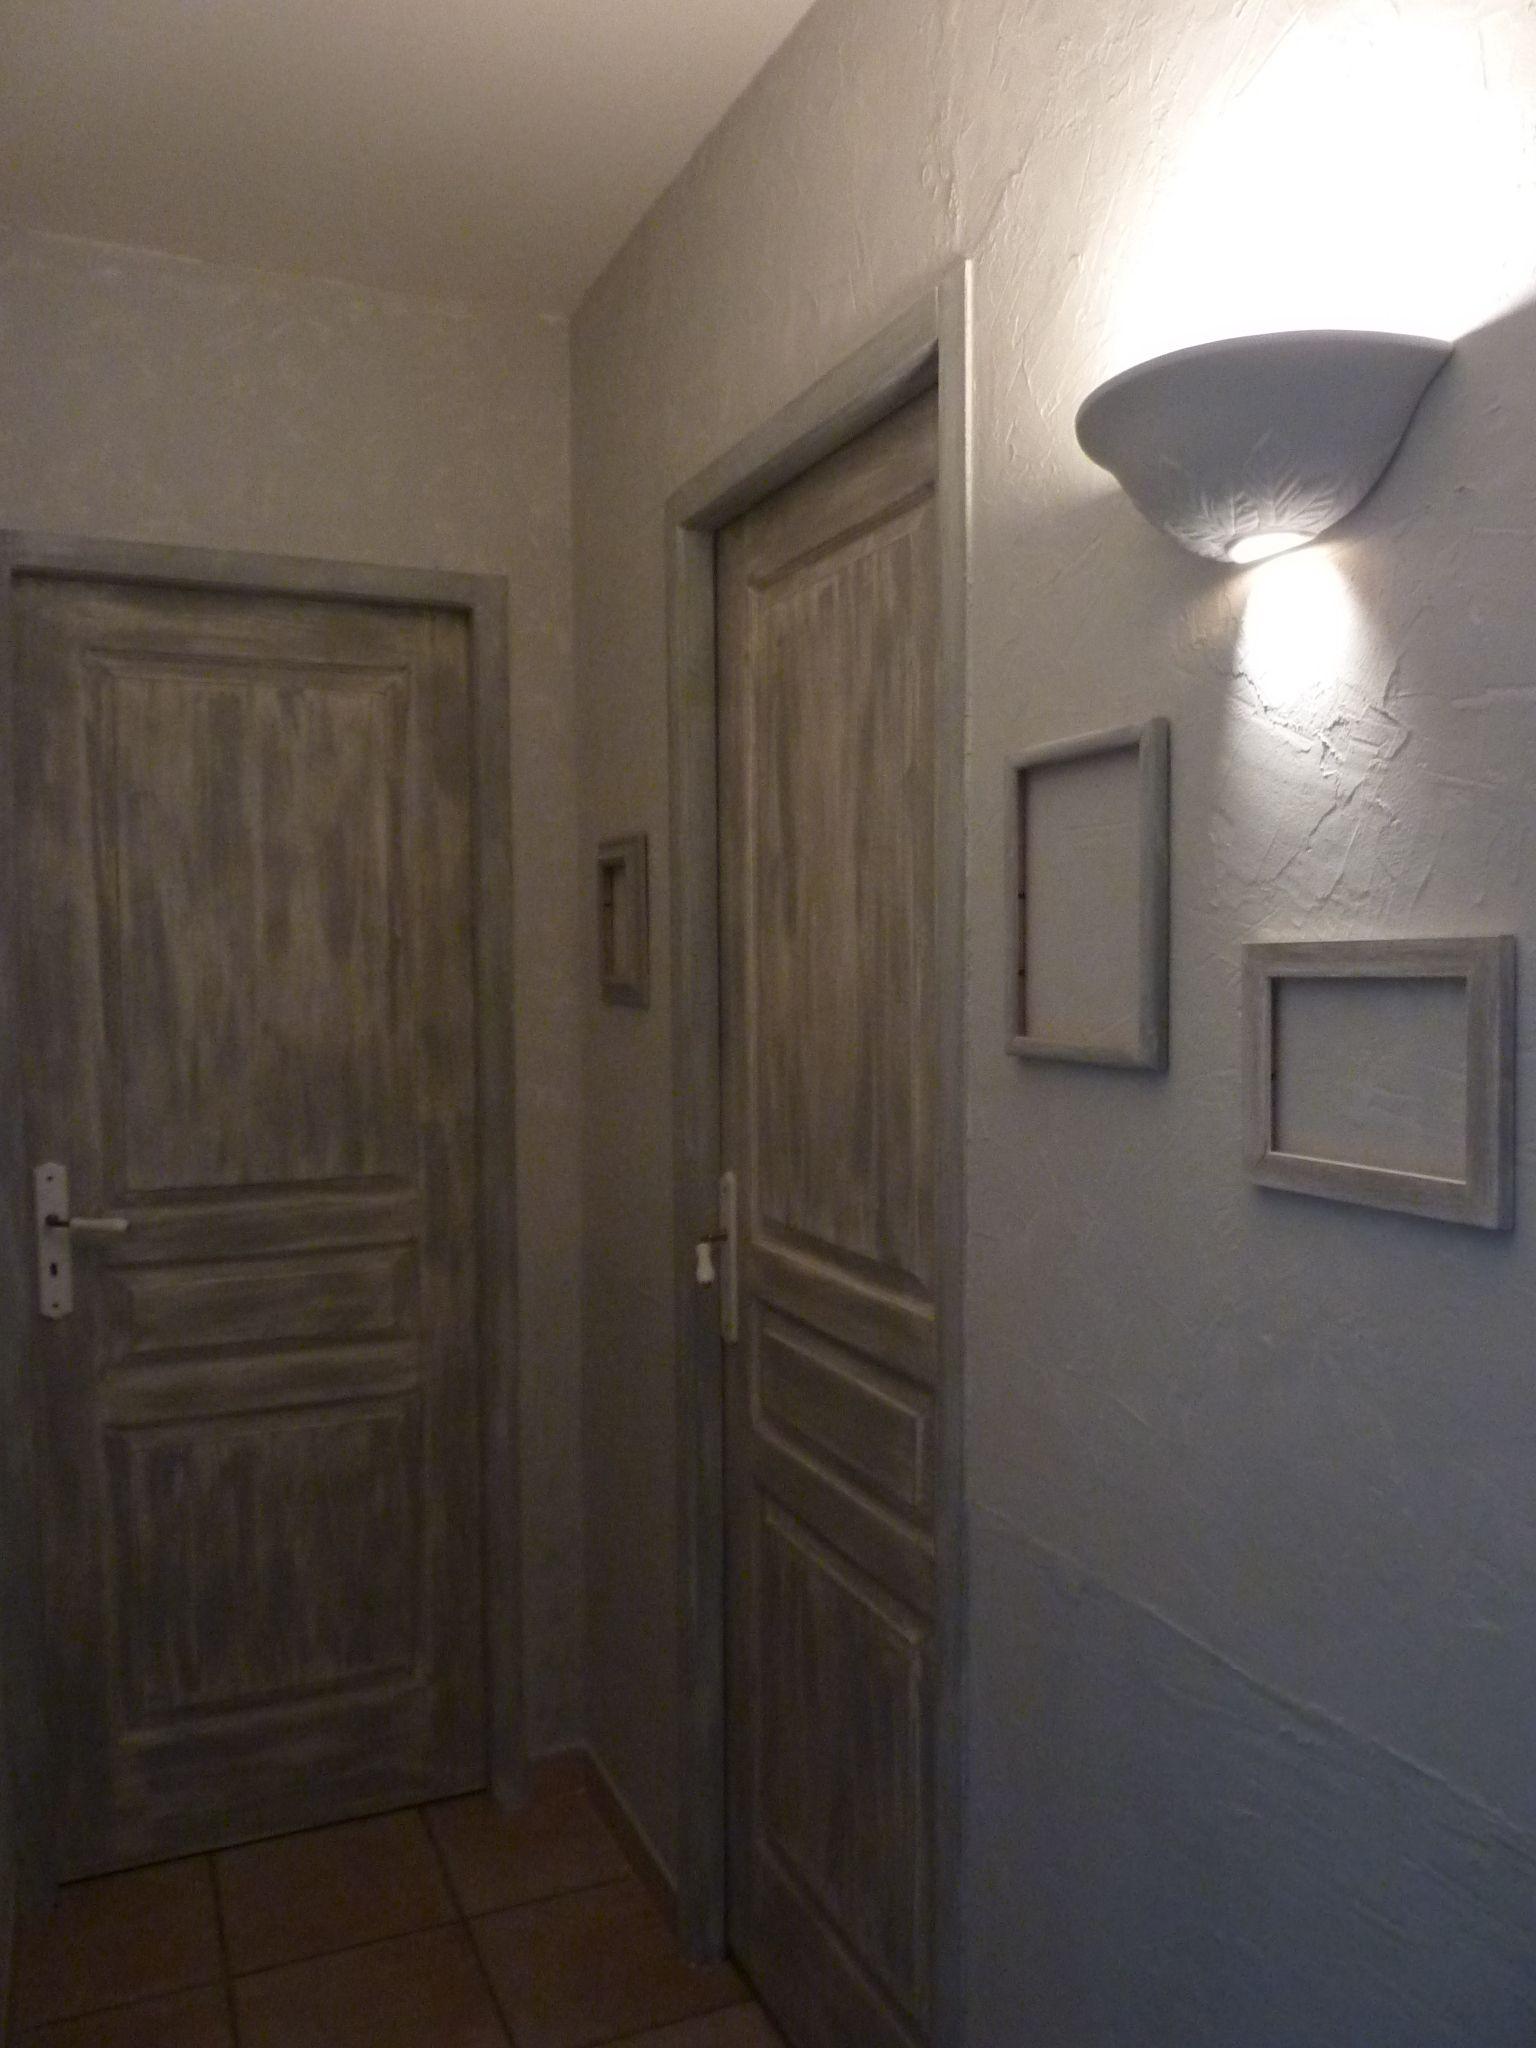 Couloir passe partout porte peinte effet vieilli Peinture porte